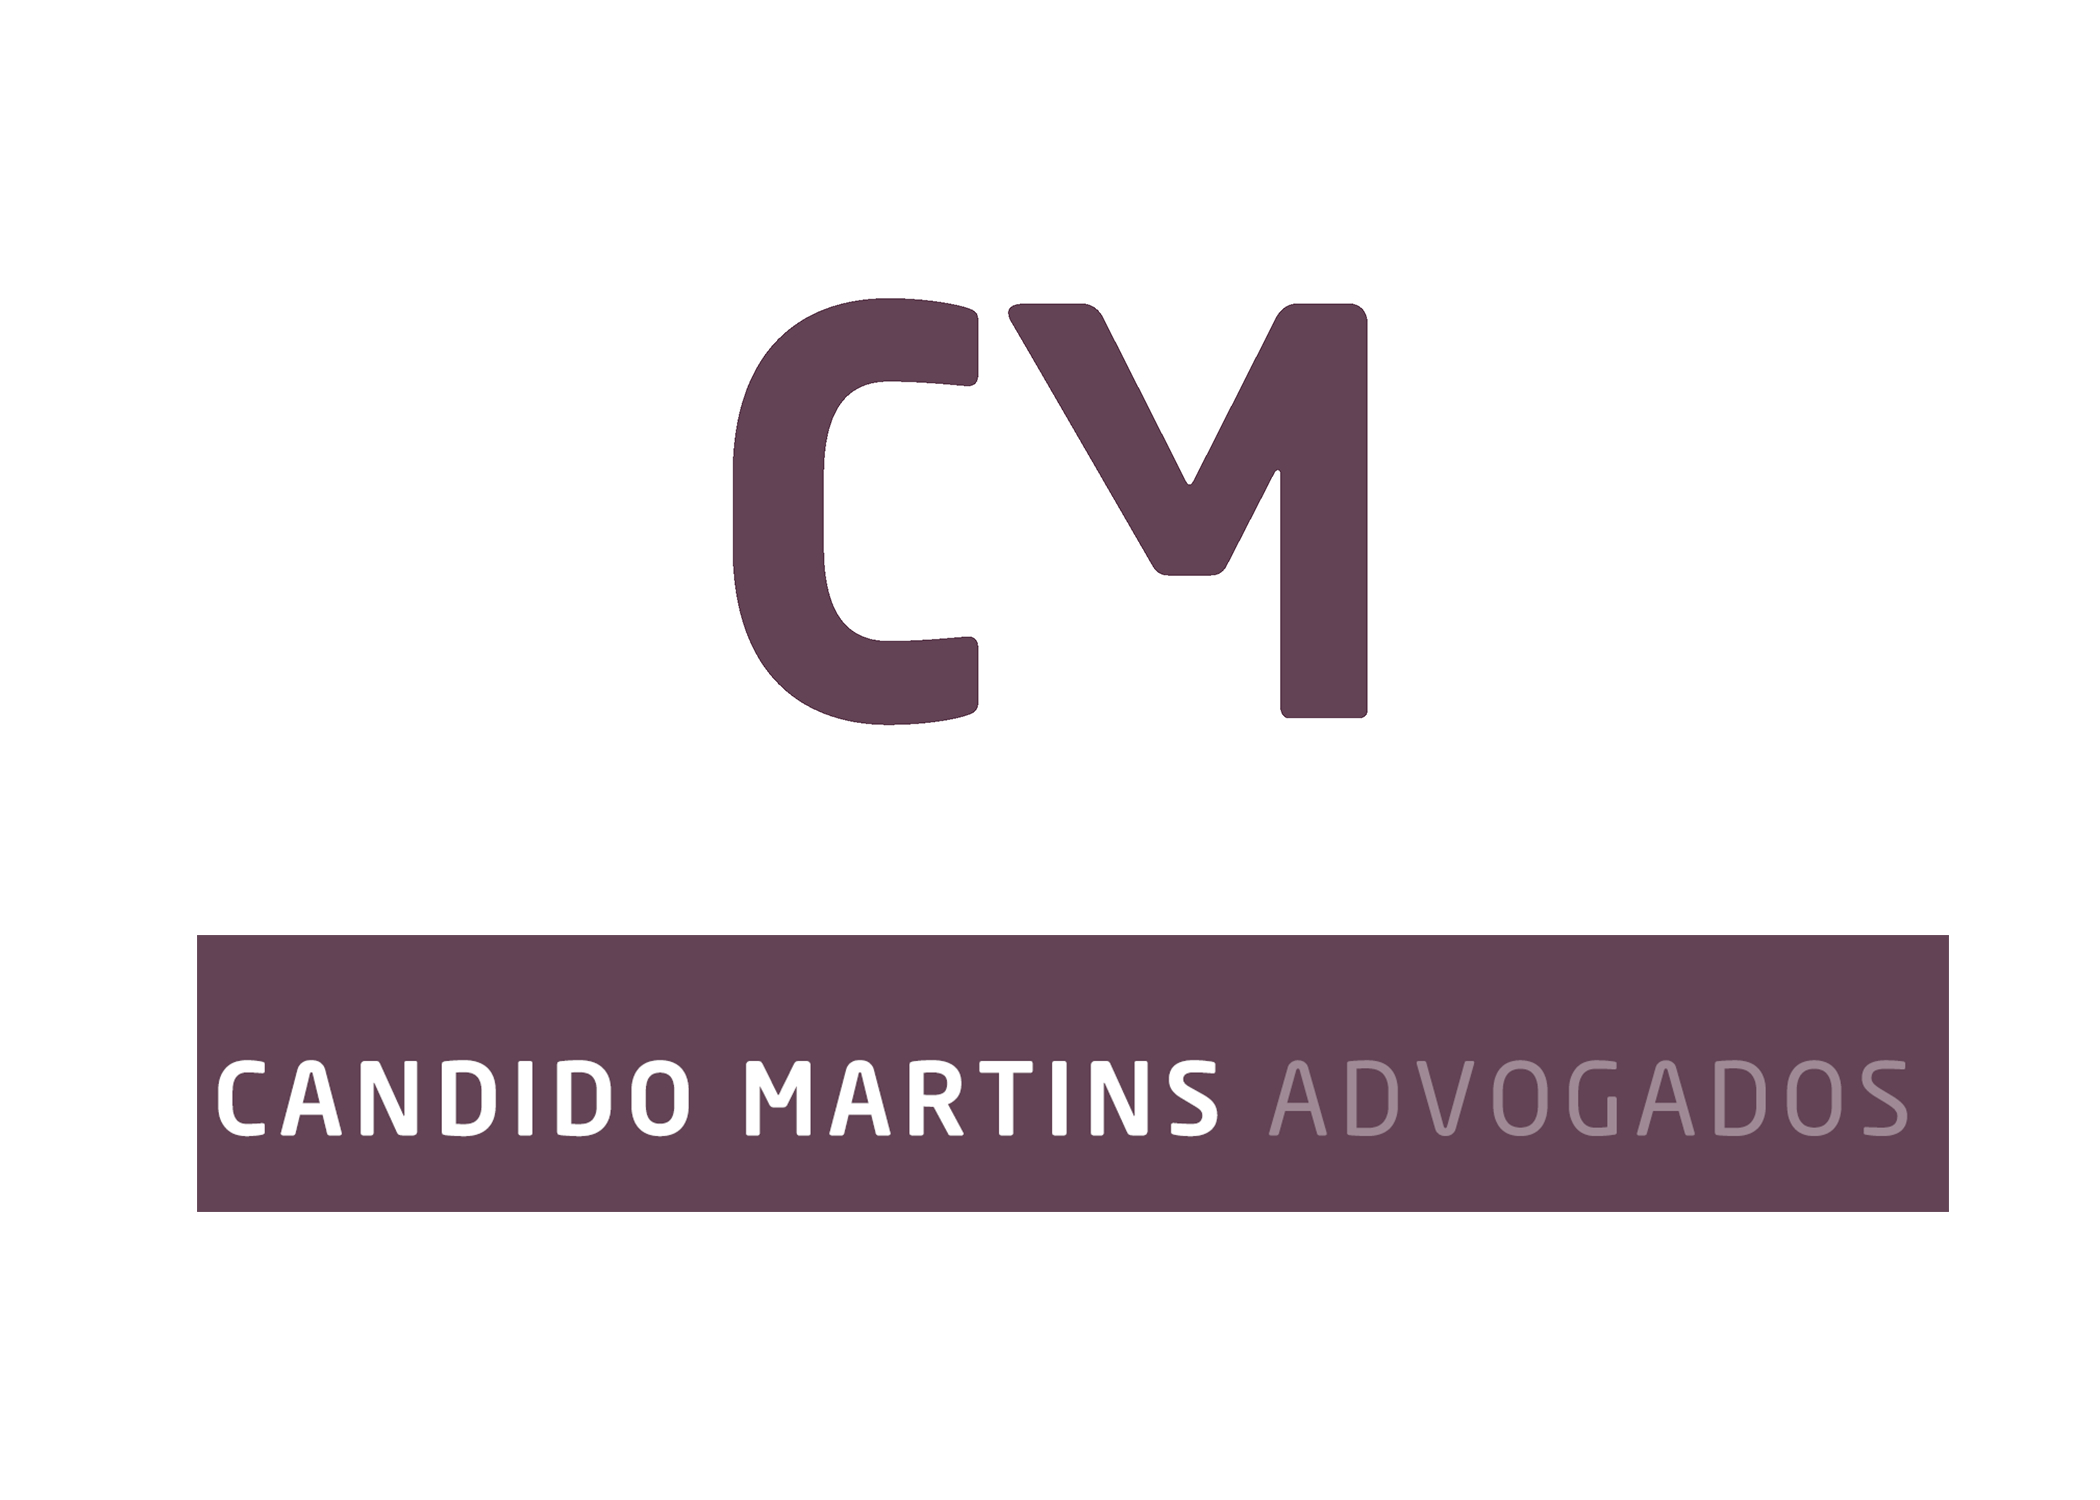 Candido Martins